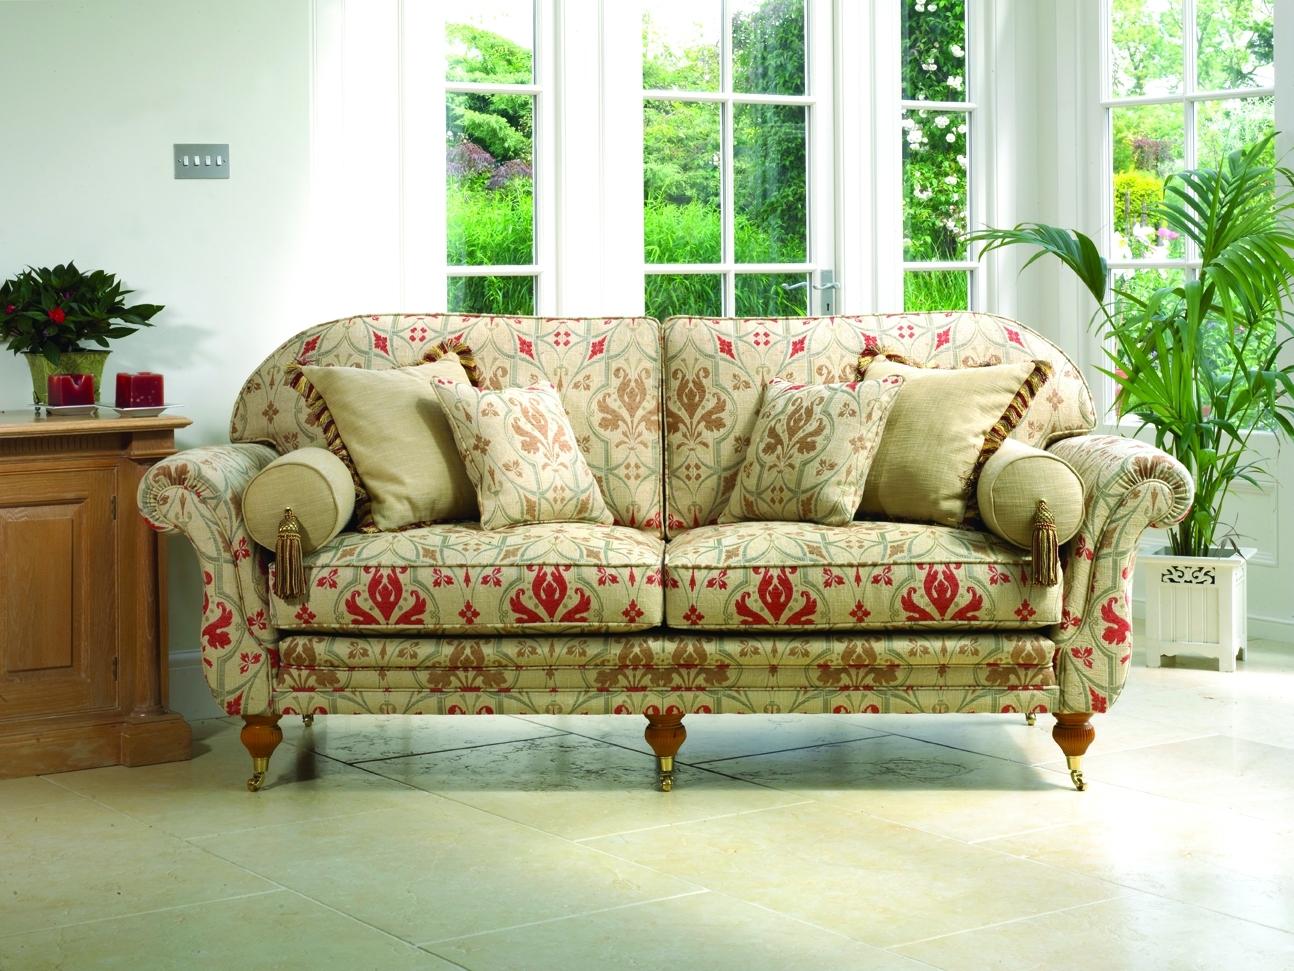 Traditional Sofas & Chairs Leicester Northampton Market Harborough Regarding Traditional Sofas (Image 9 of 10)